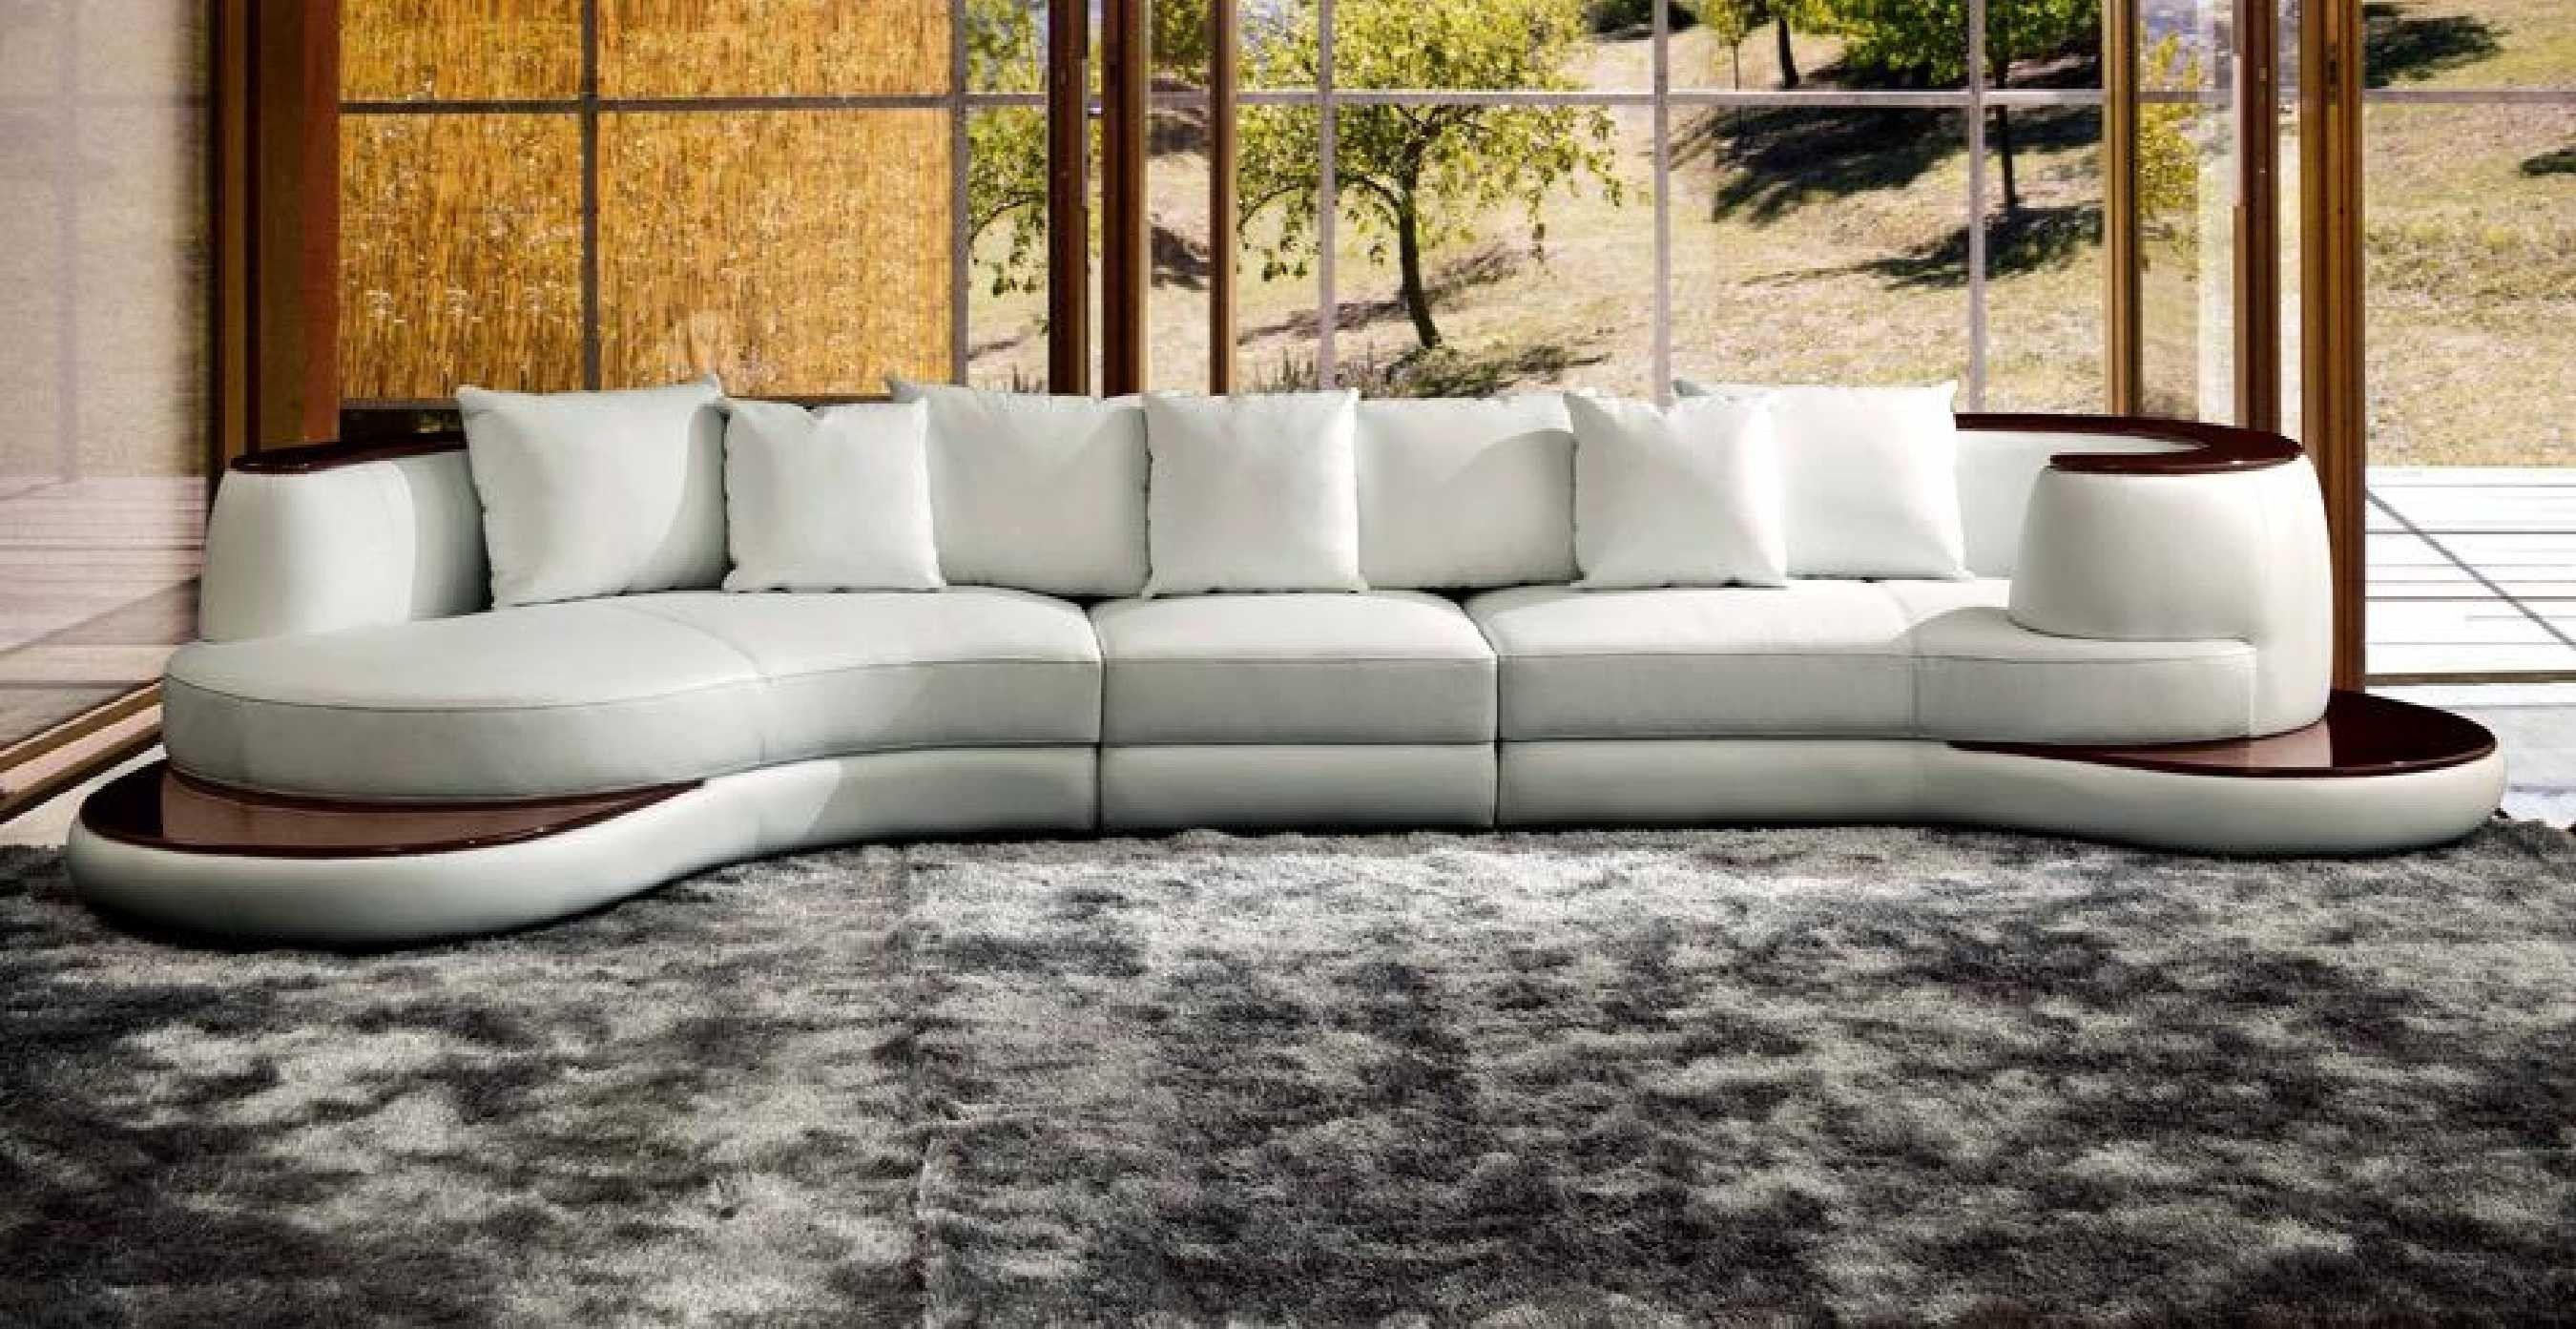 Rounded Corner Leather Sofa